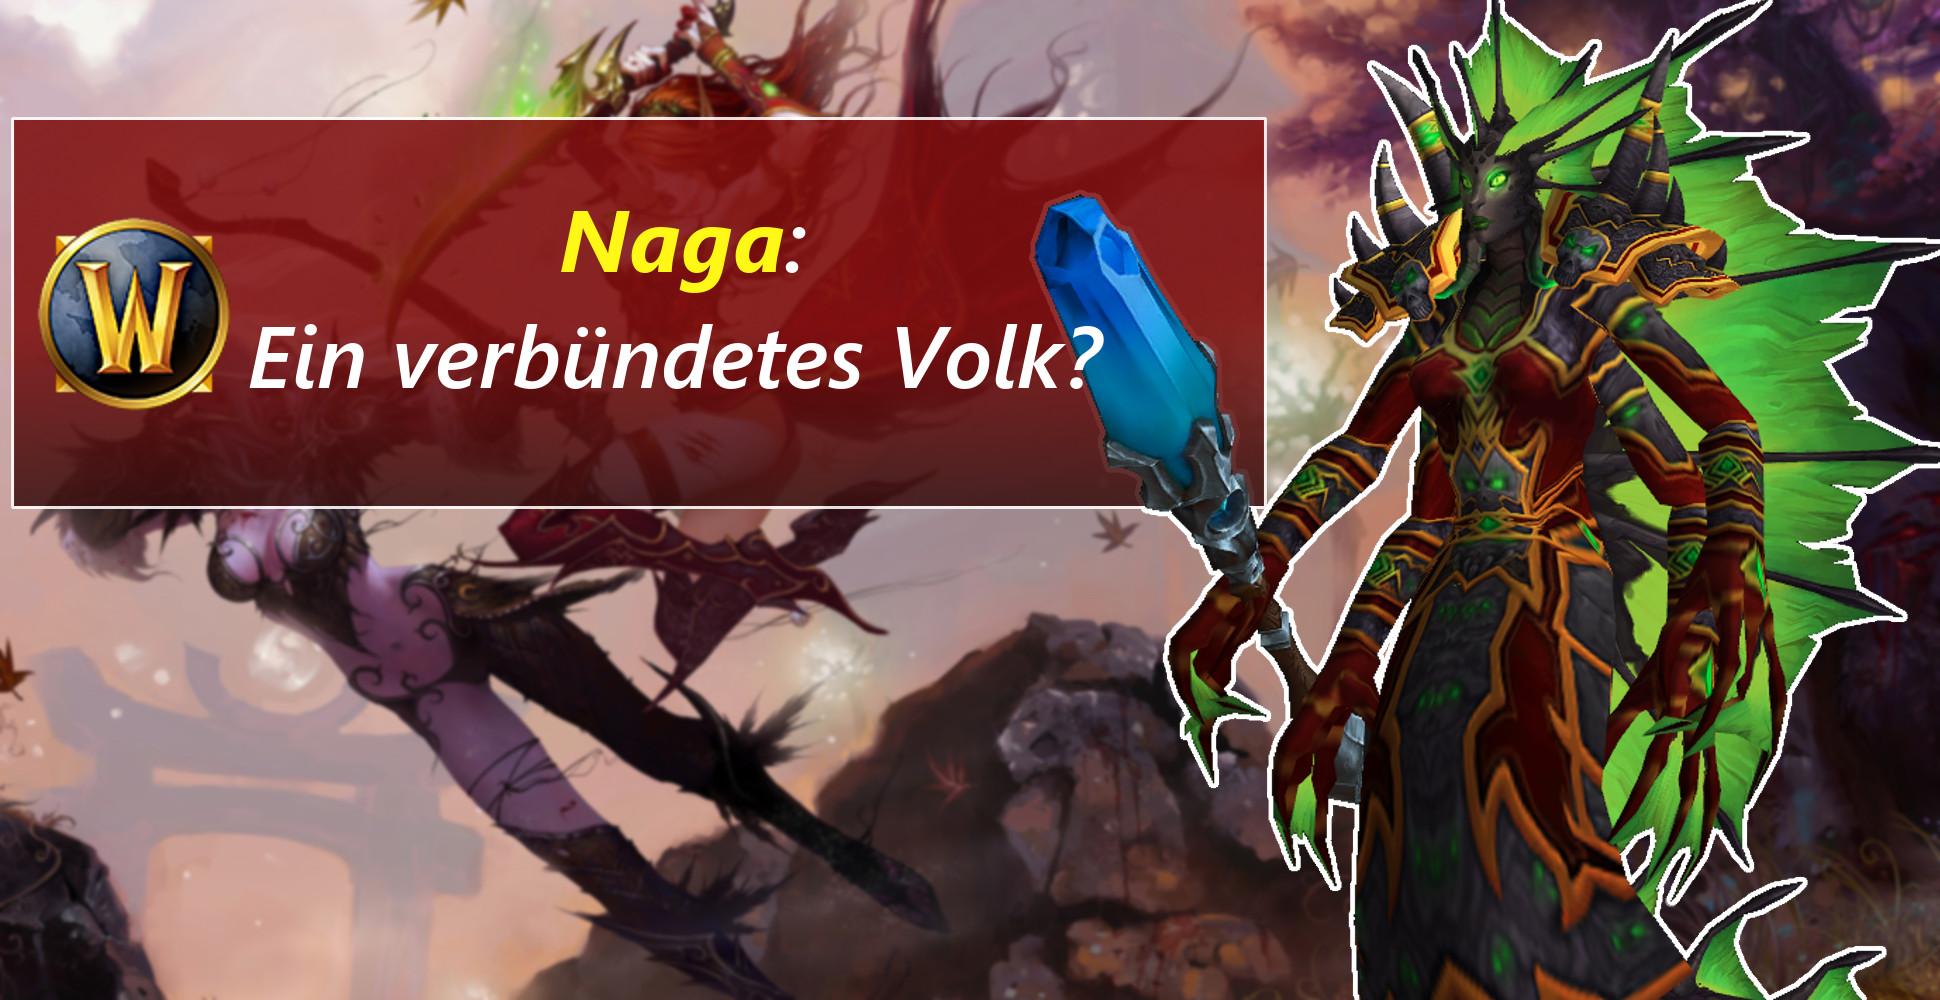 WoW Naga Verbuendetes Volk Title